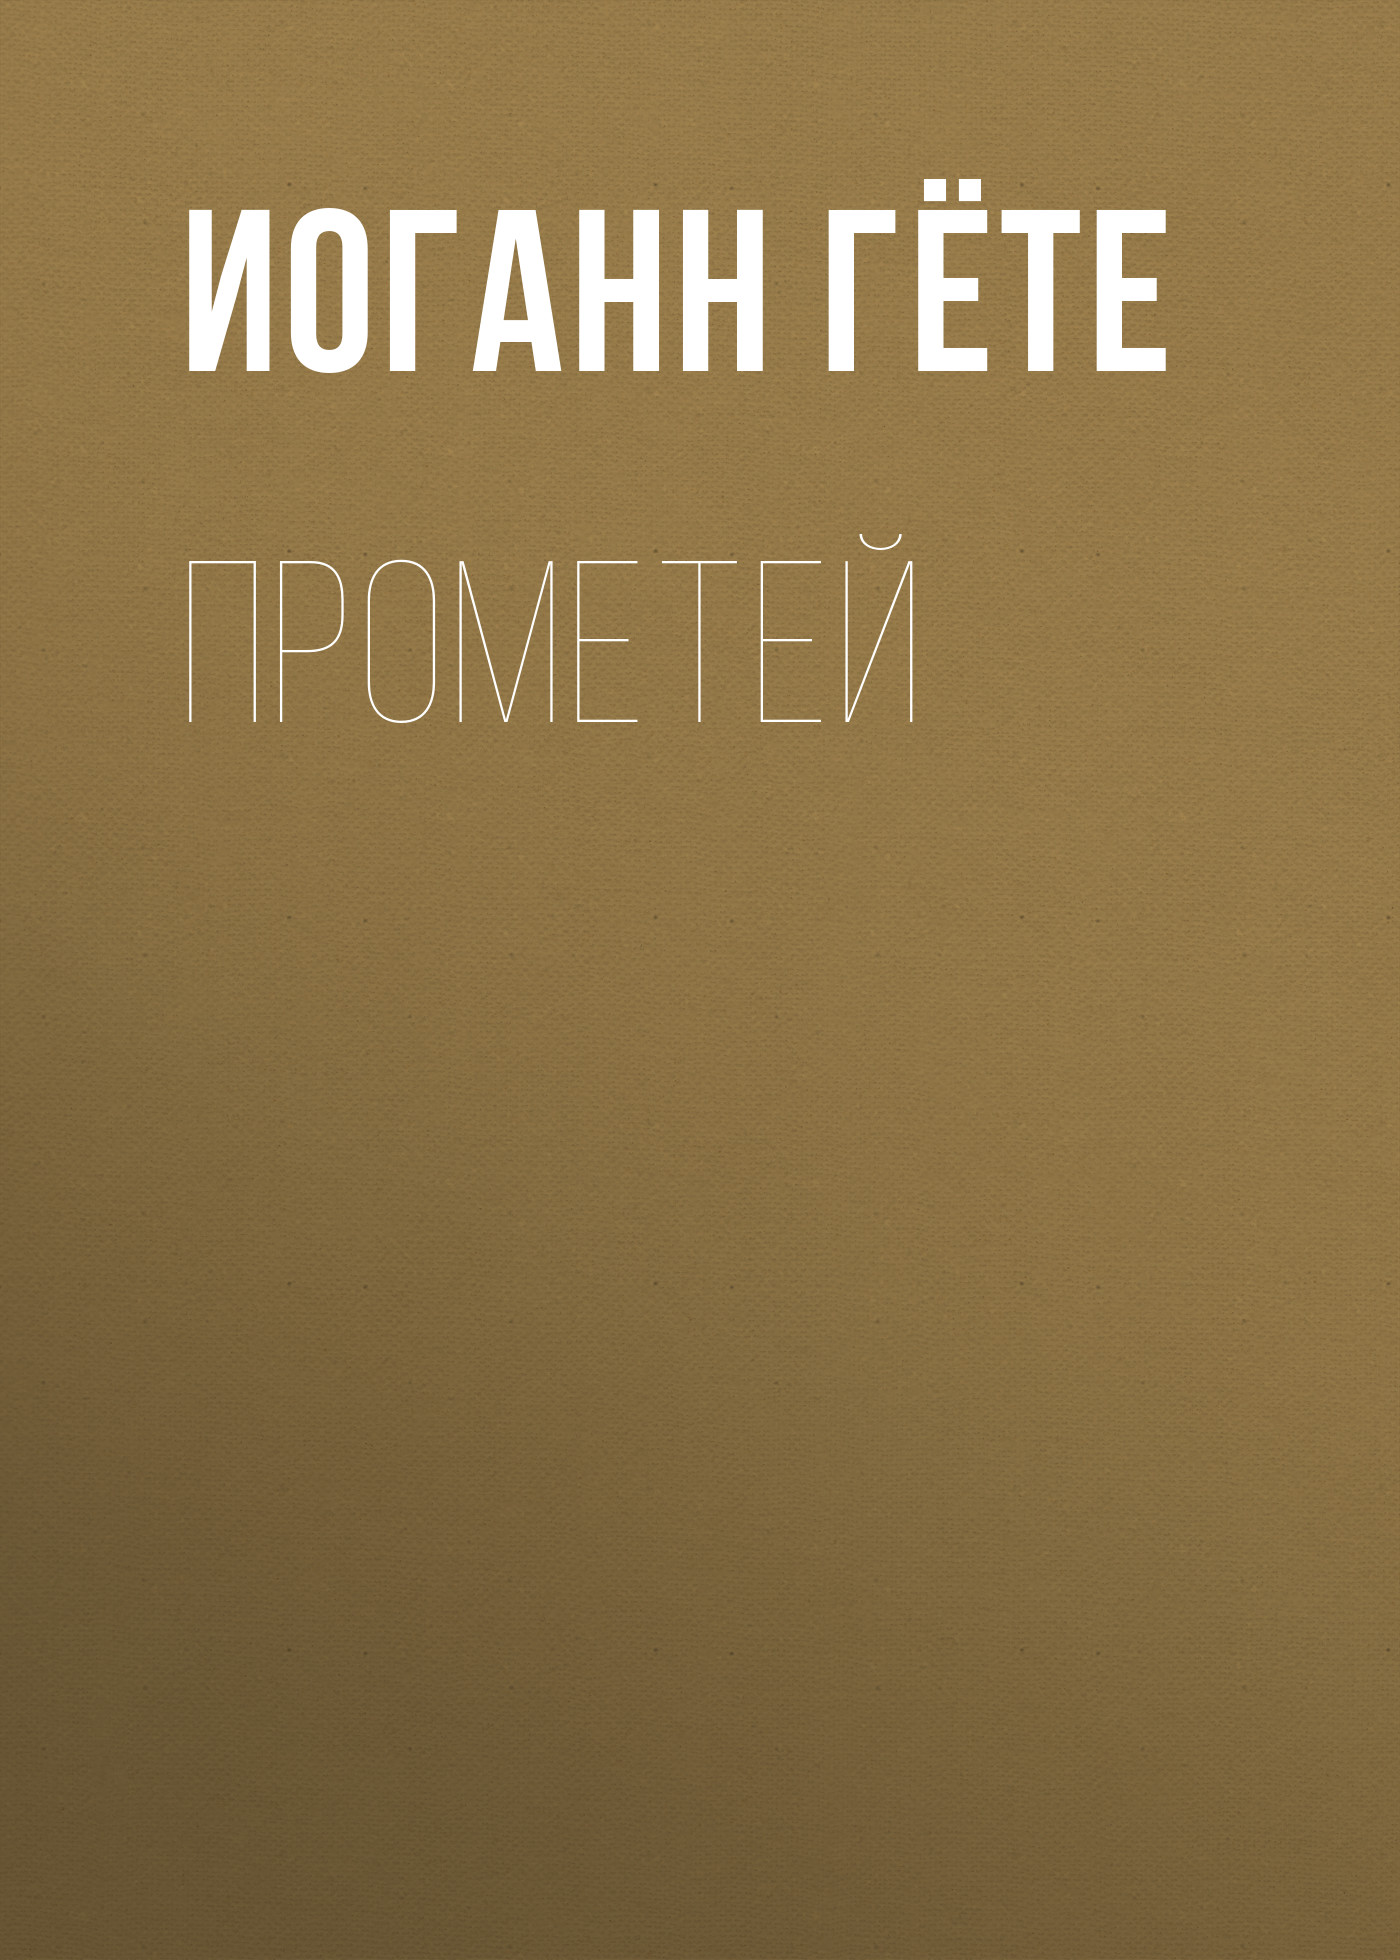 prometey